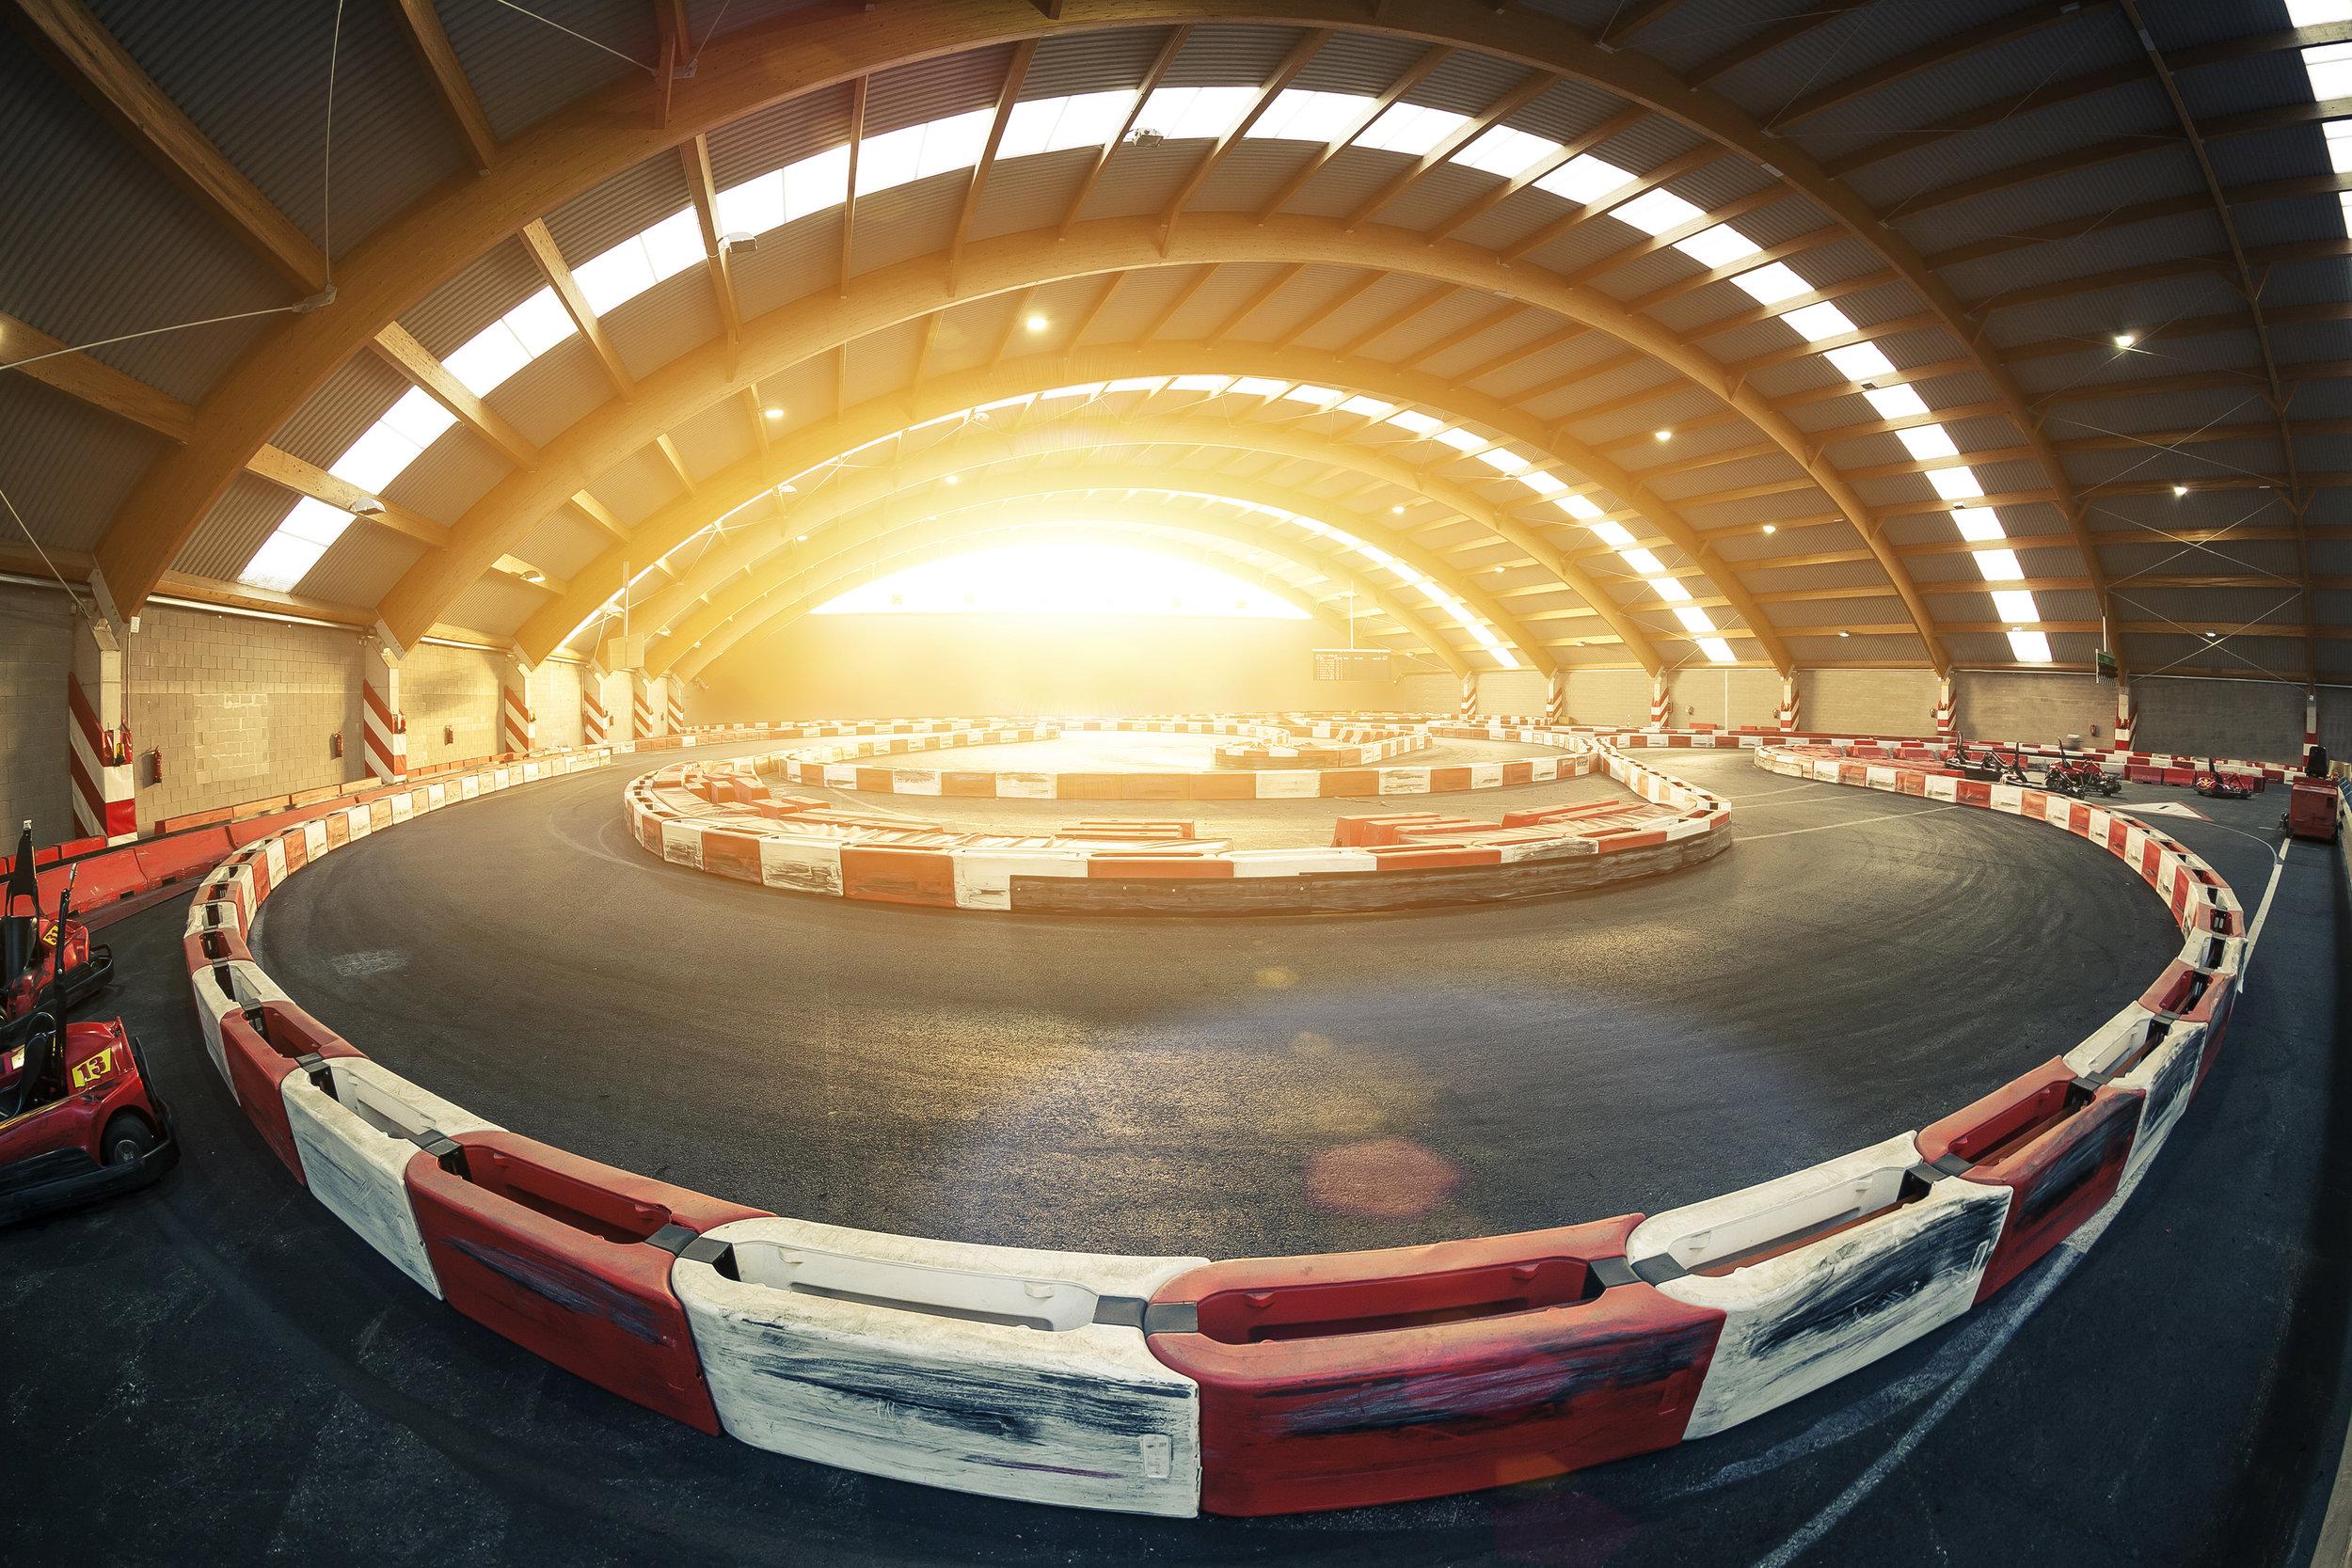 cesare ferrari fotografo sport racing go kart ngk